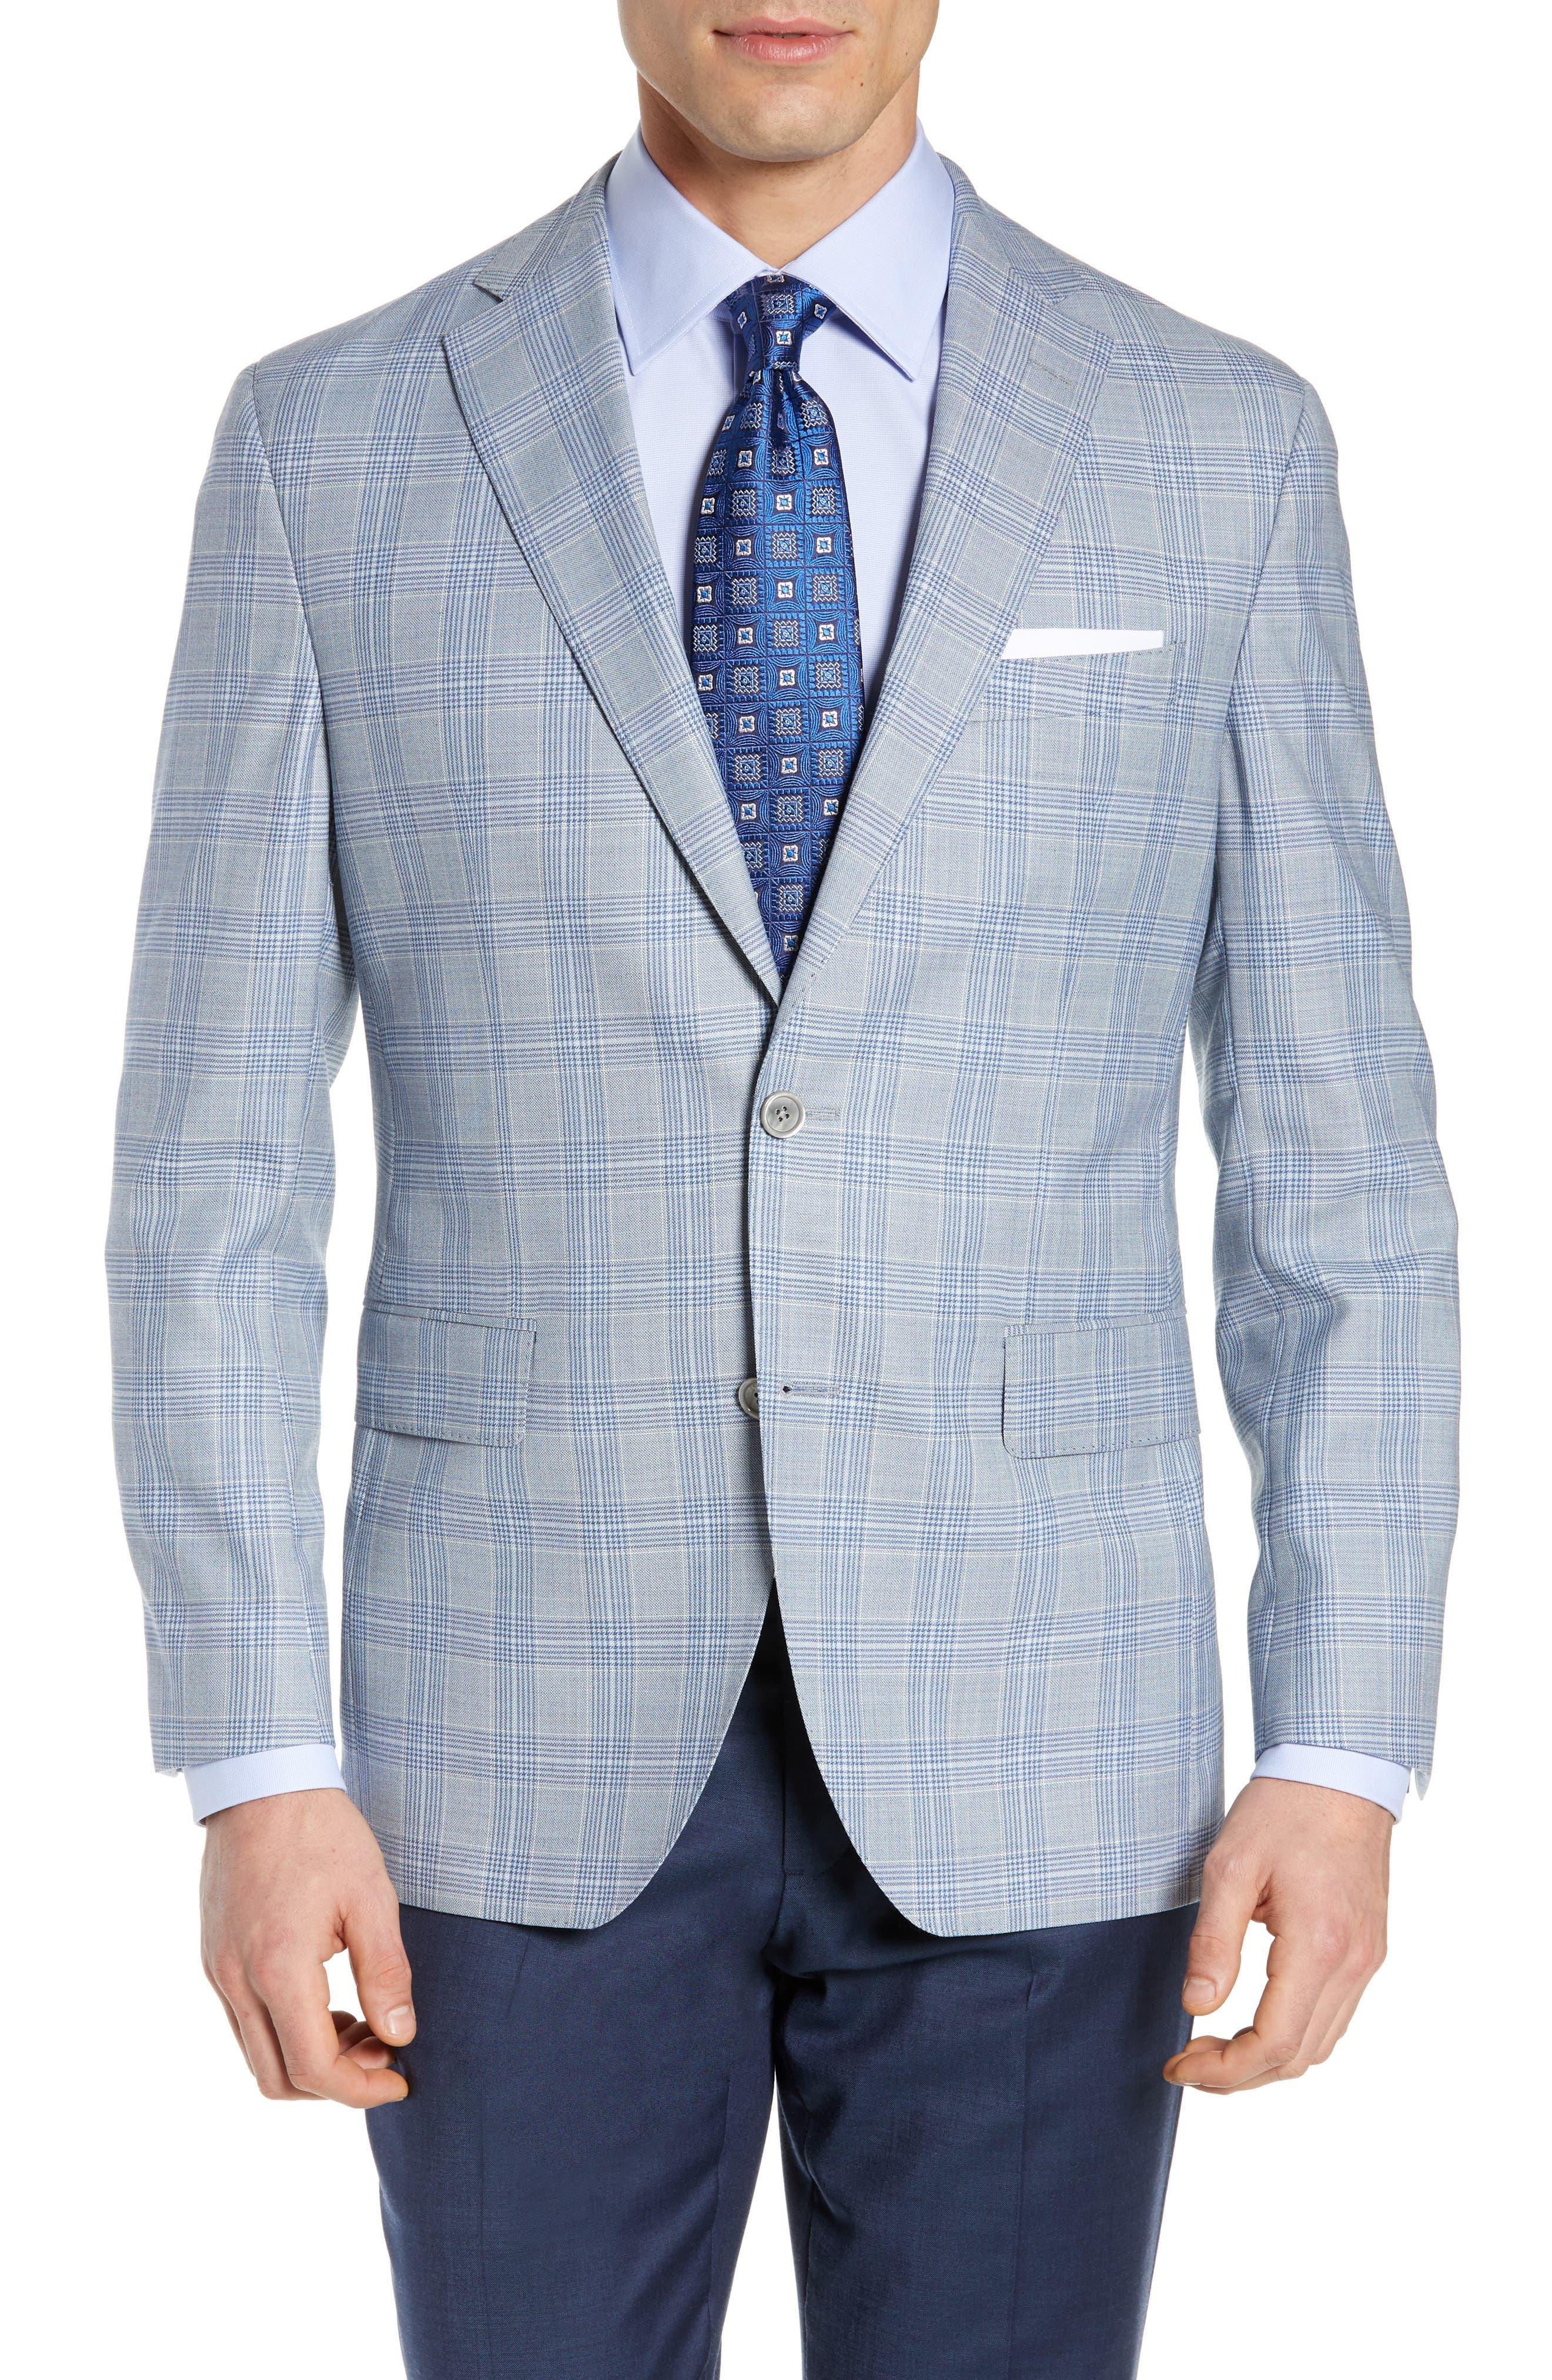 DAVID DONAHUE Arnold Classic Fit Plaid Wool Sport Coat, Main, color, BLUE